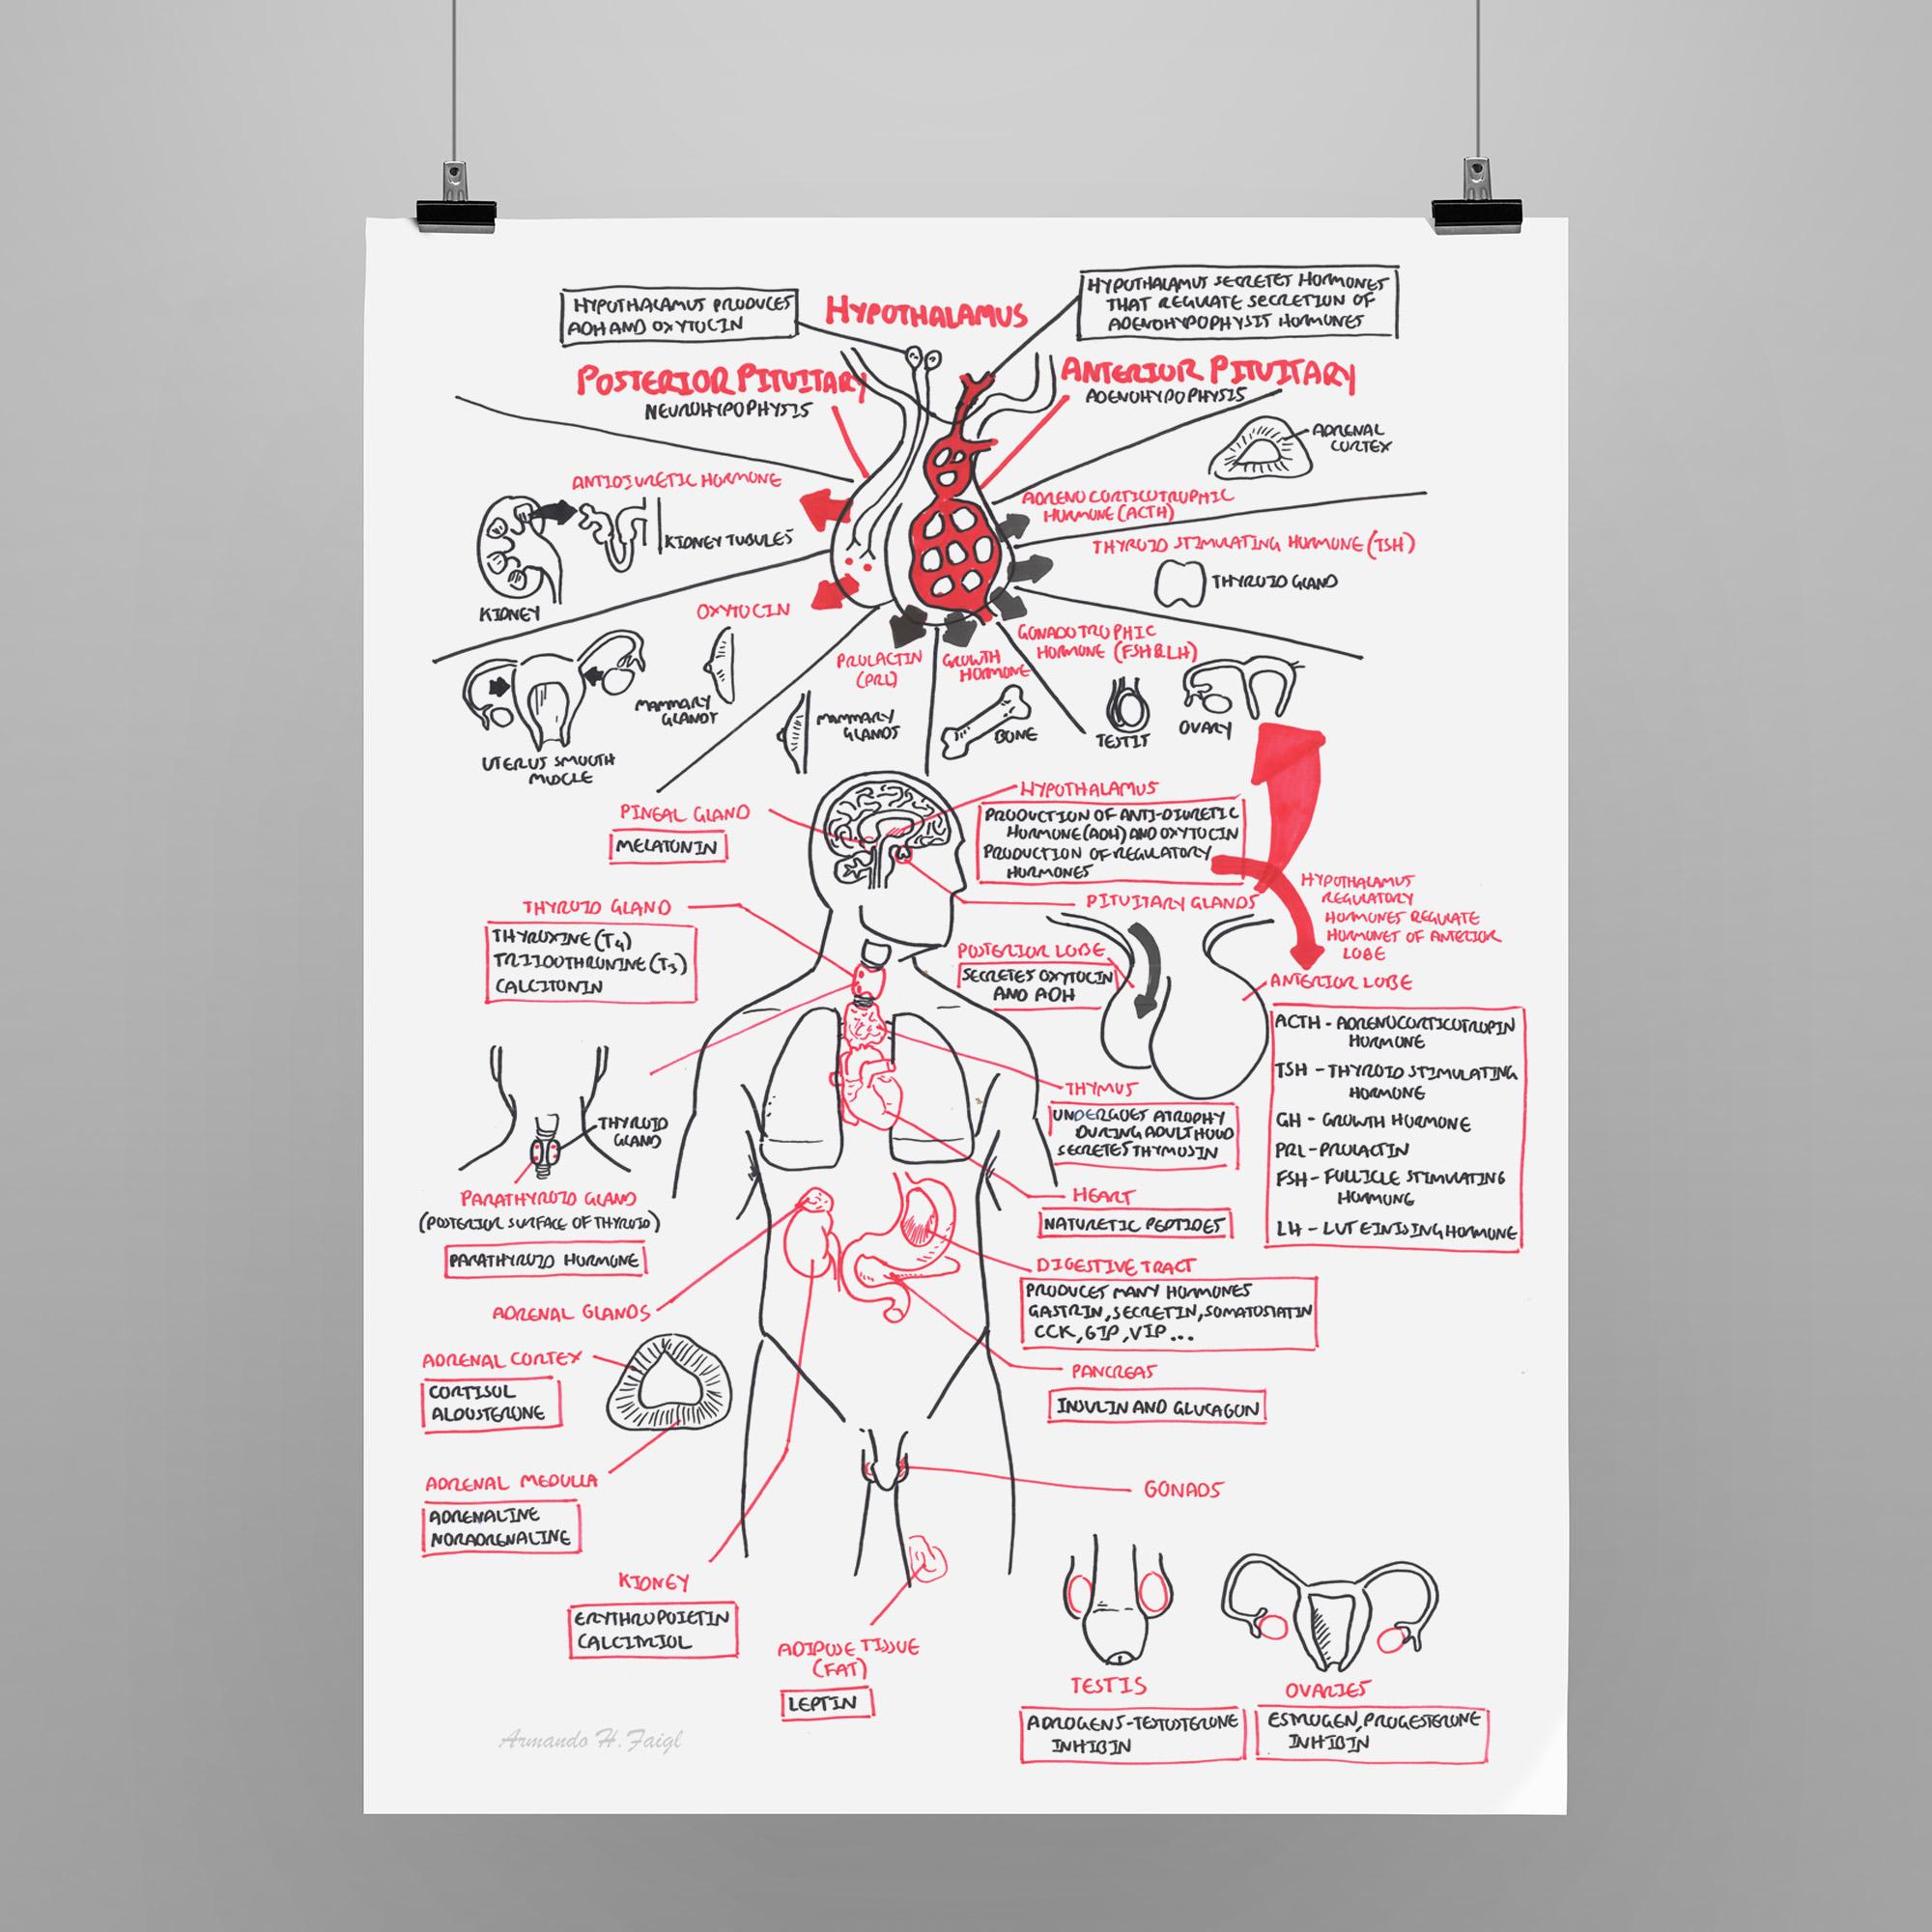 Endocrine Overview Armando Hasudungan Online Store